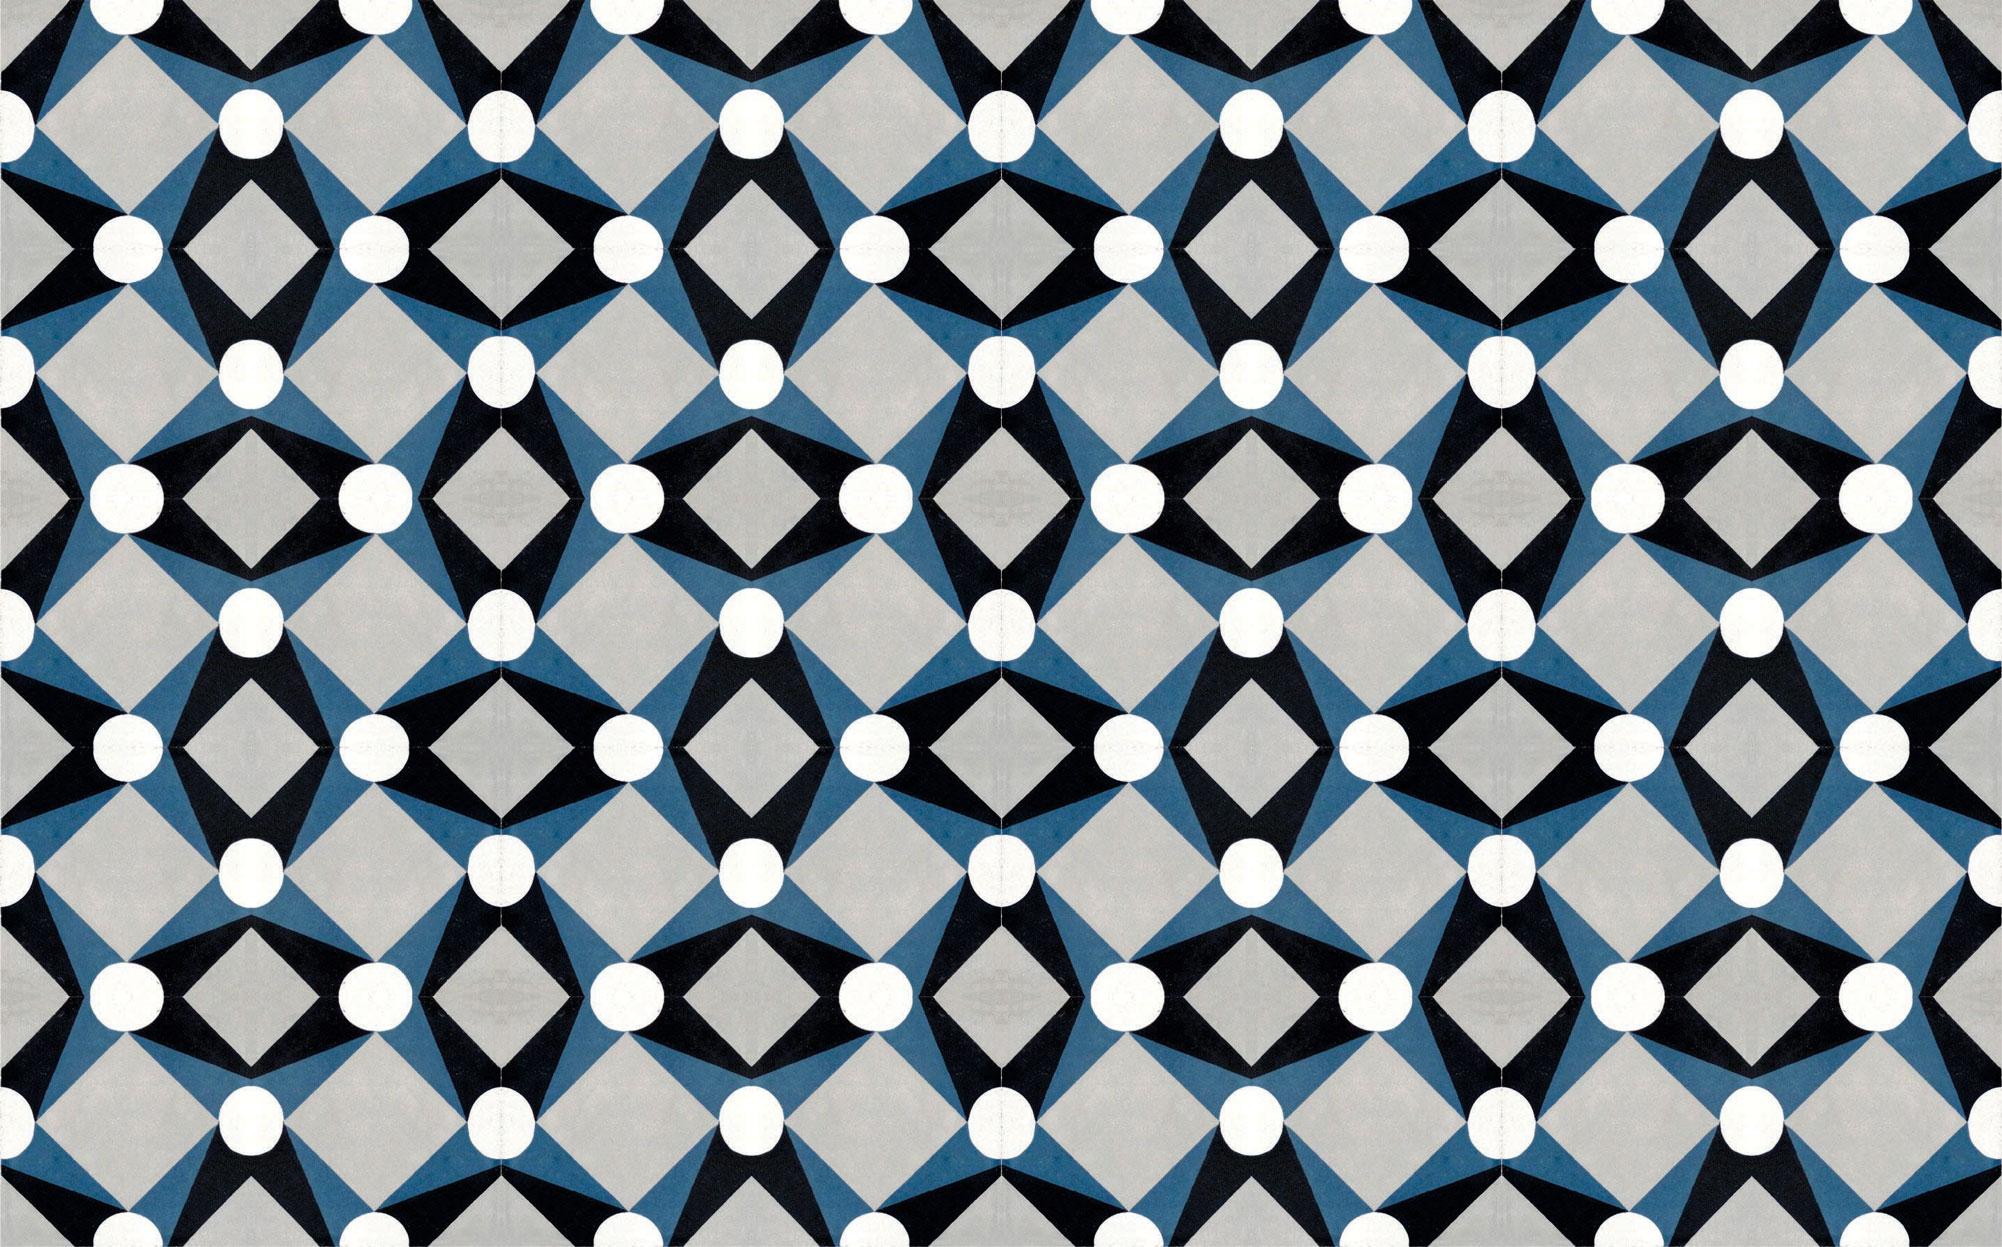 francisco-toledo-cuadratura-tridimensional